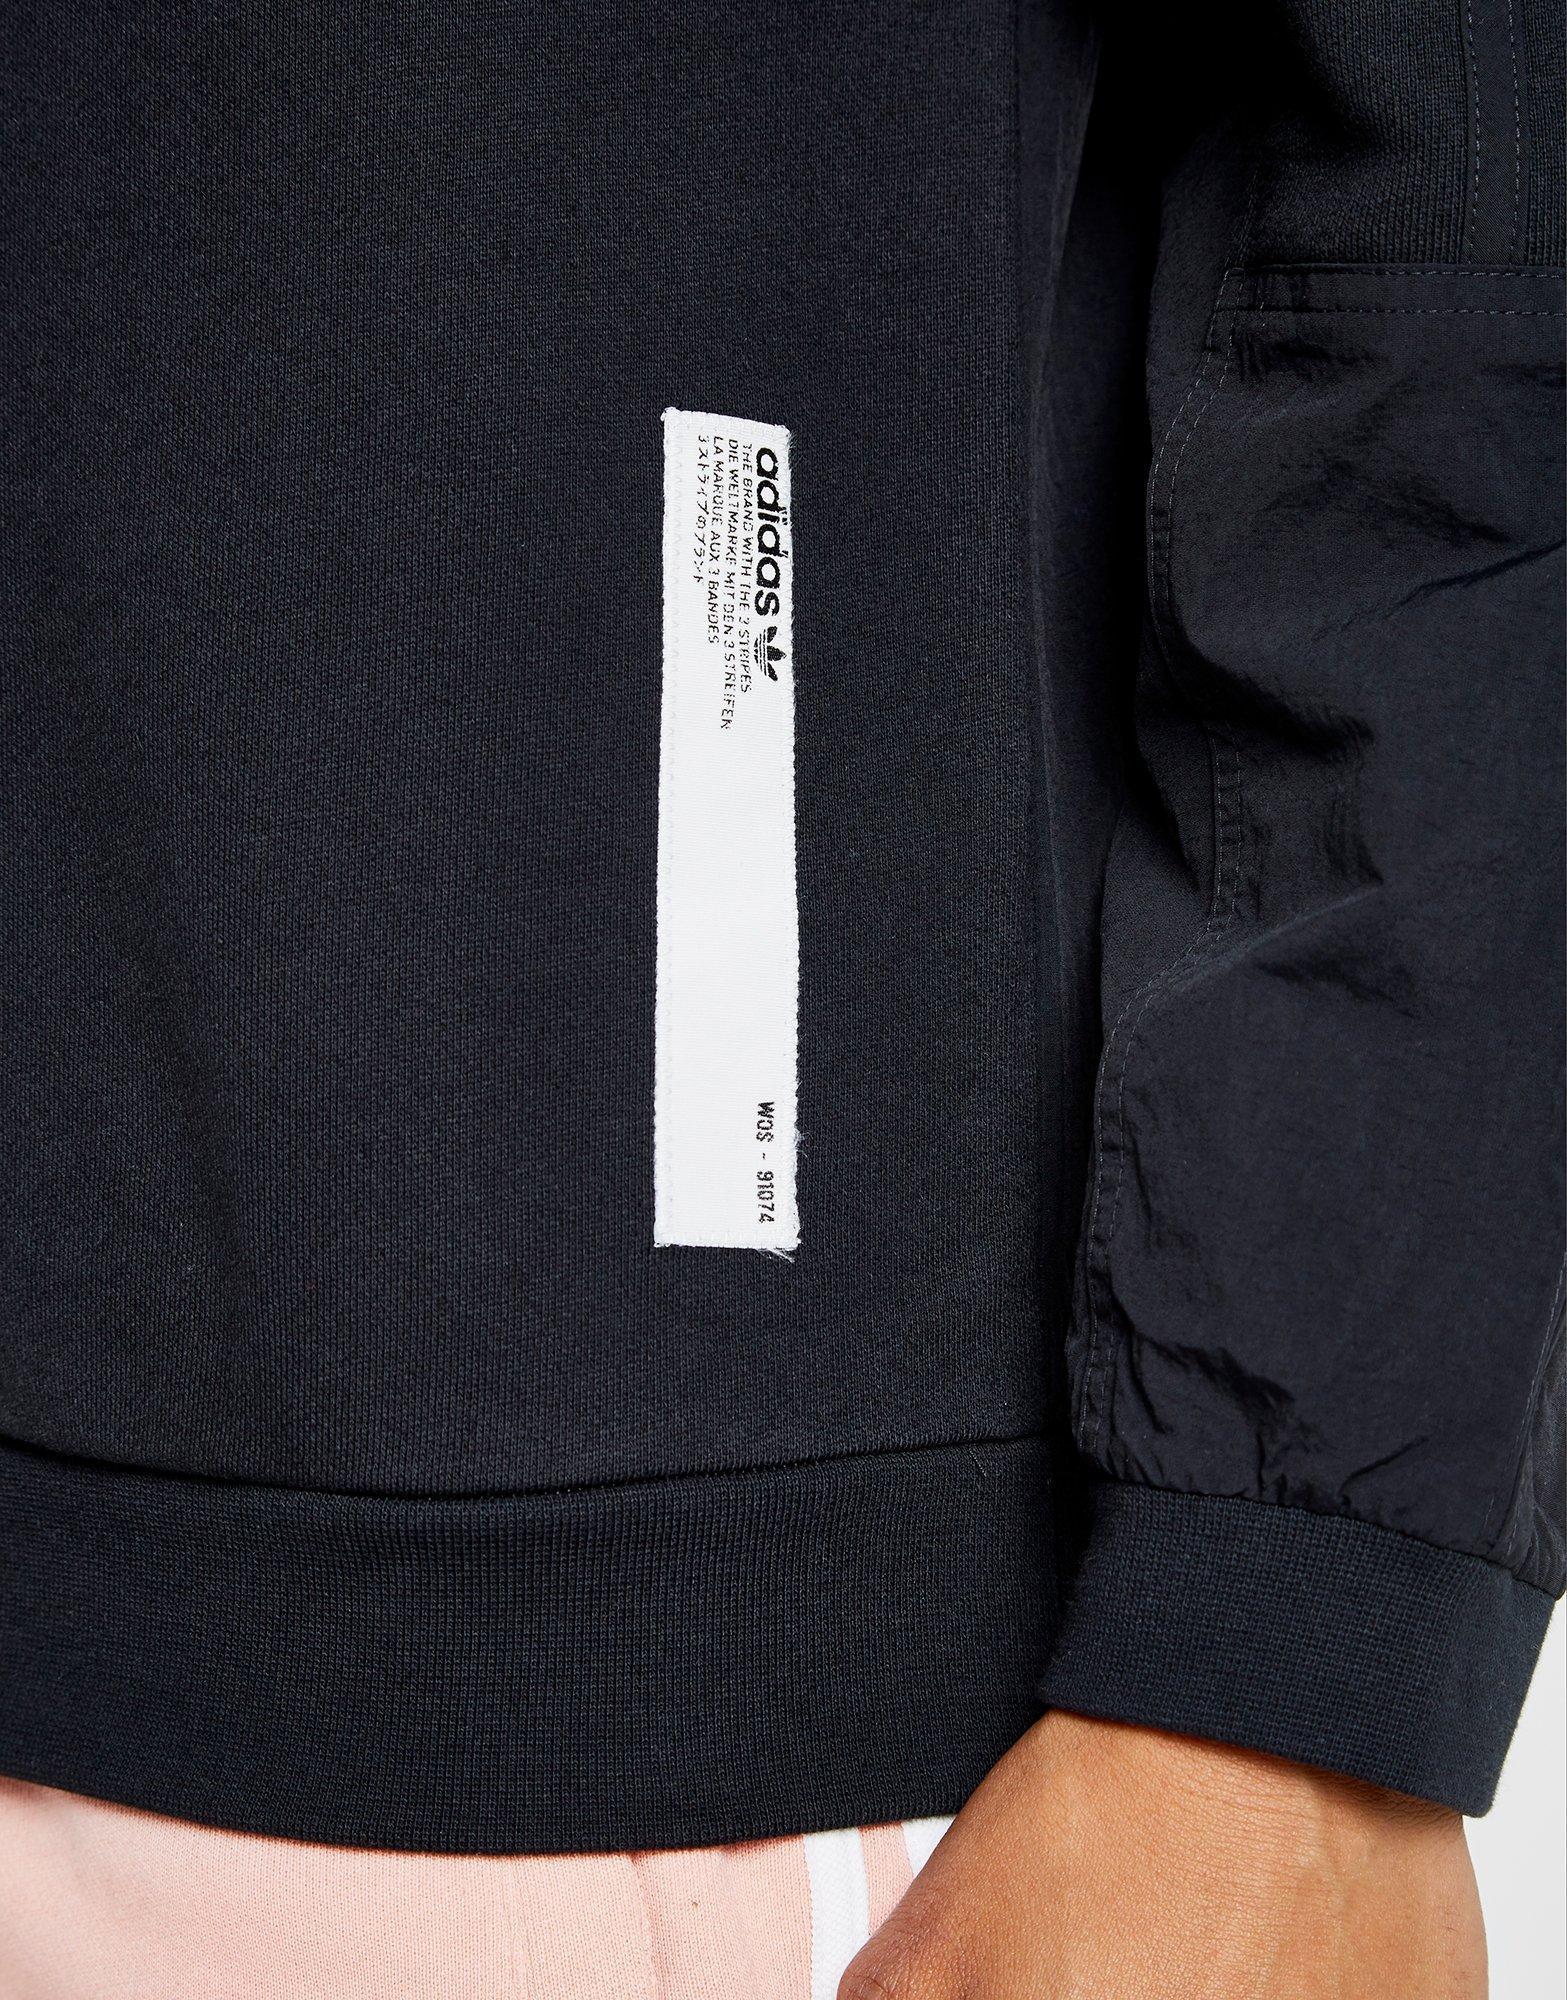 8a6579ea7246 Adidas Nmd Sweatshirt In Black For Men Lyst